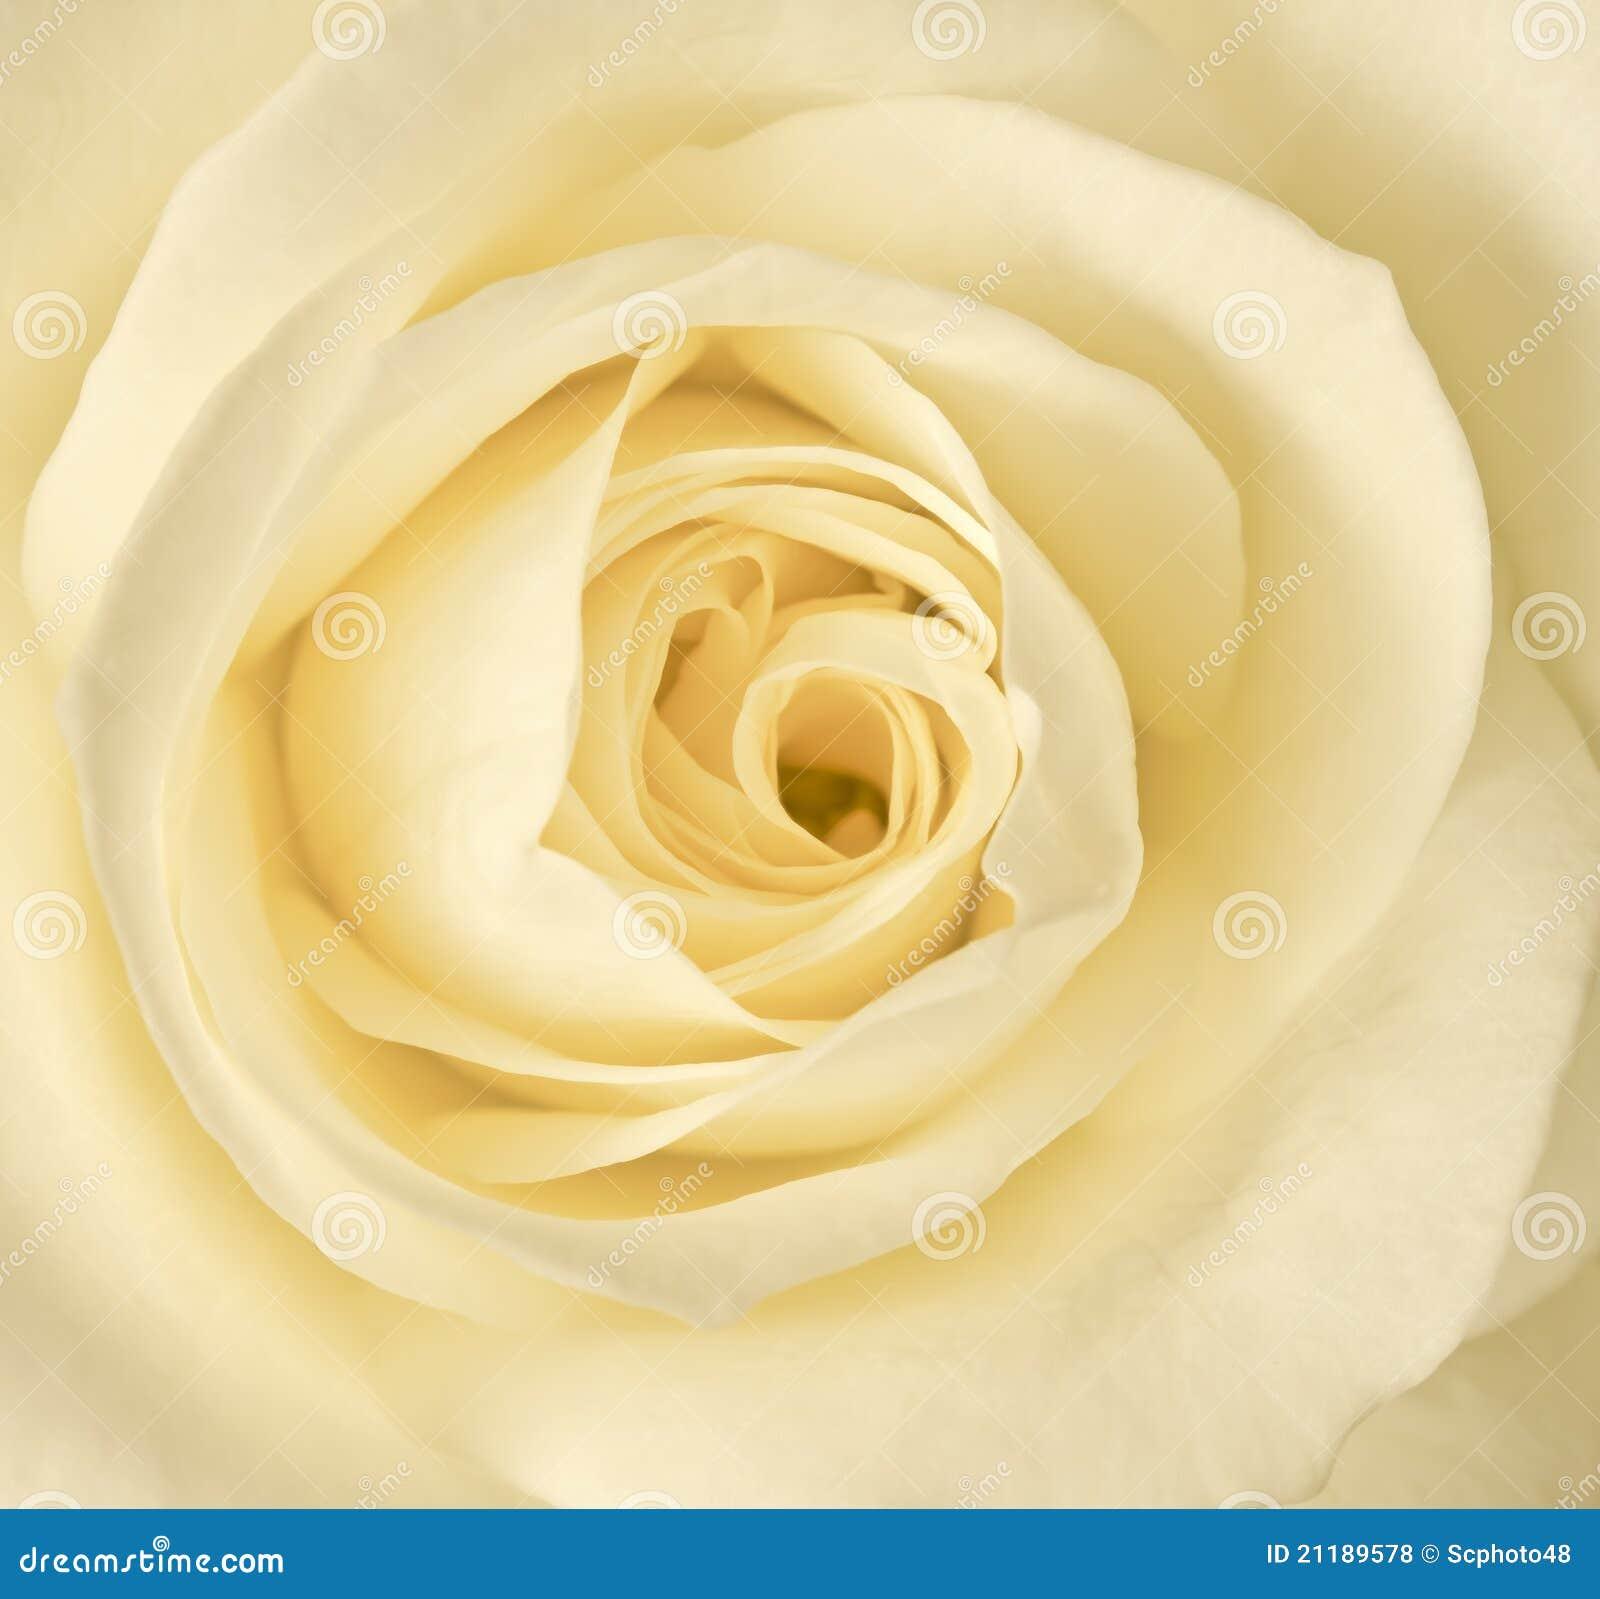 Close up cream rose stock photo image of view for Cream rose wallpaper